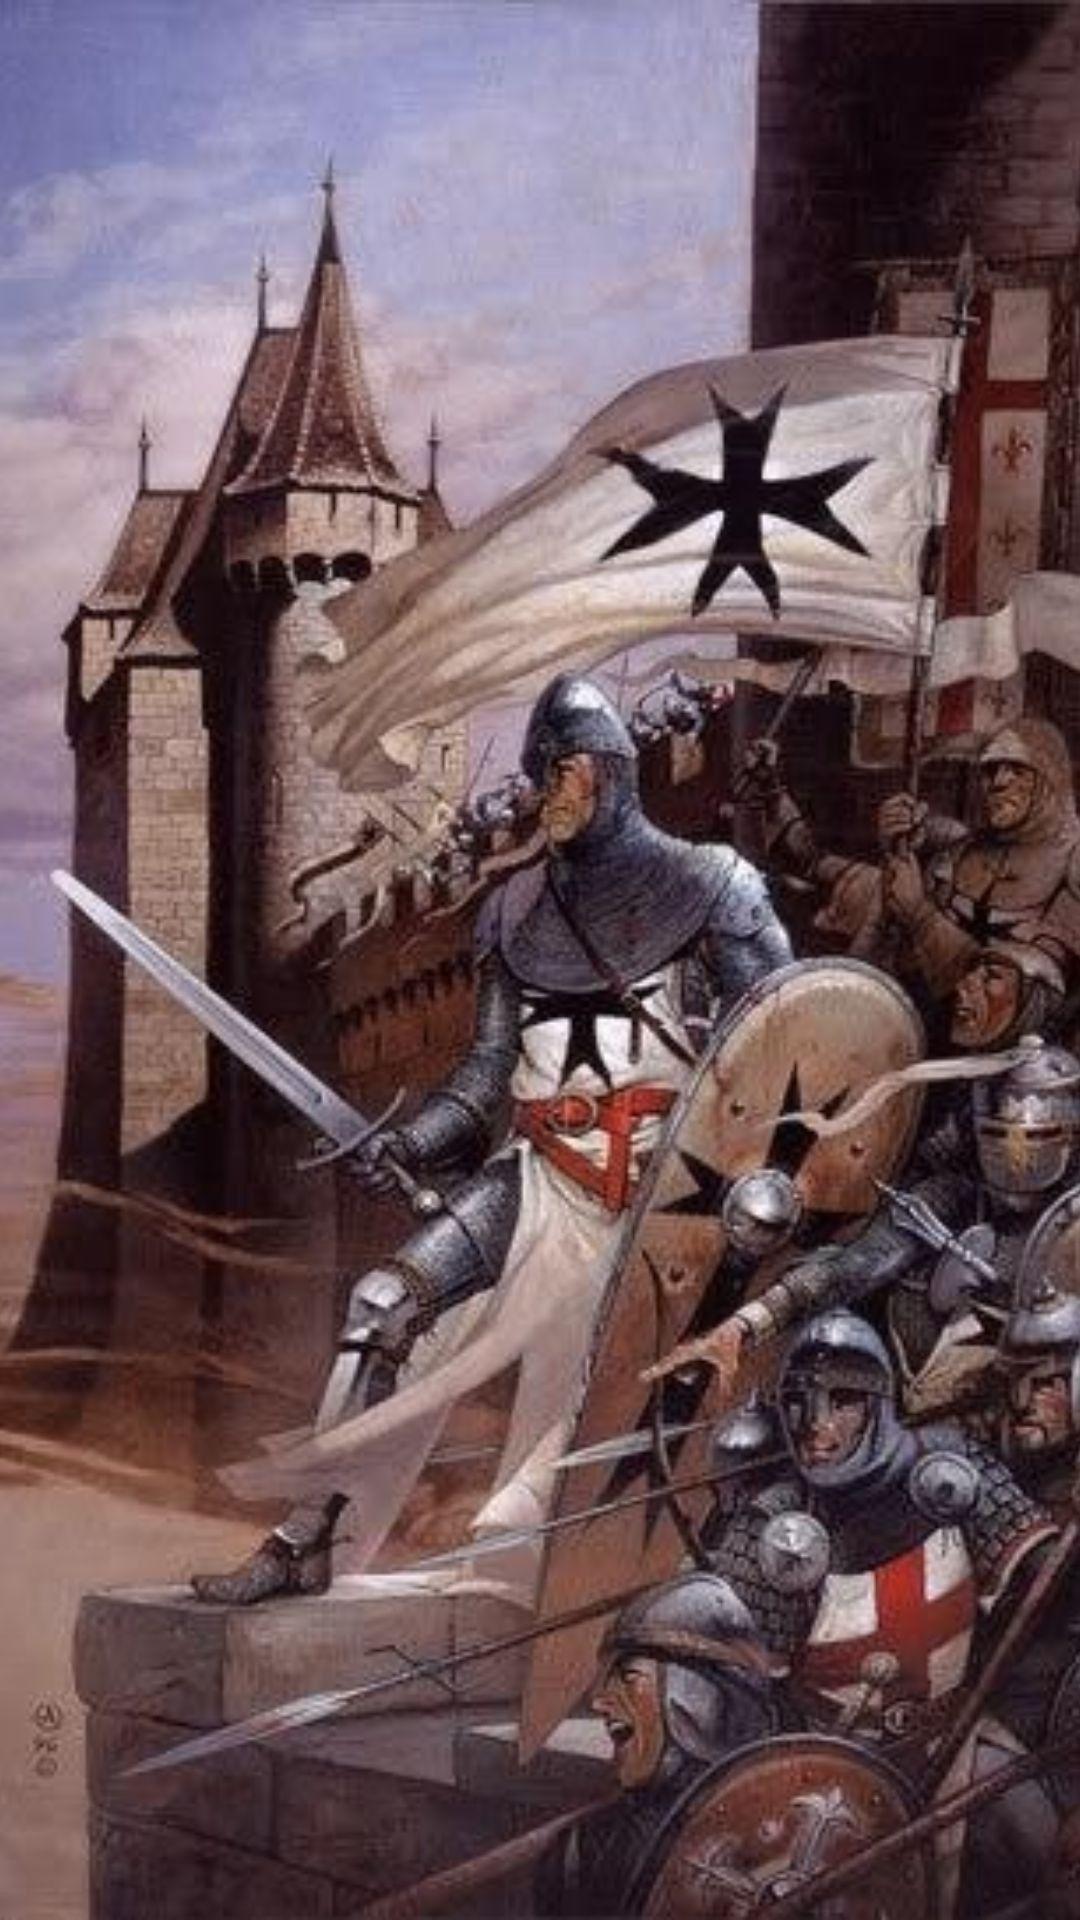 Crusader Knight, Medieval World, Medieval Knight, Medieval Times, Medieval